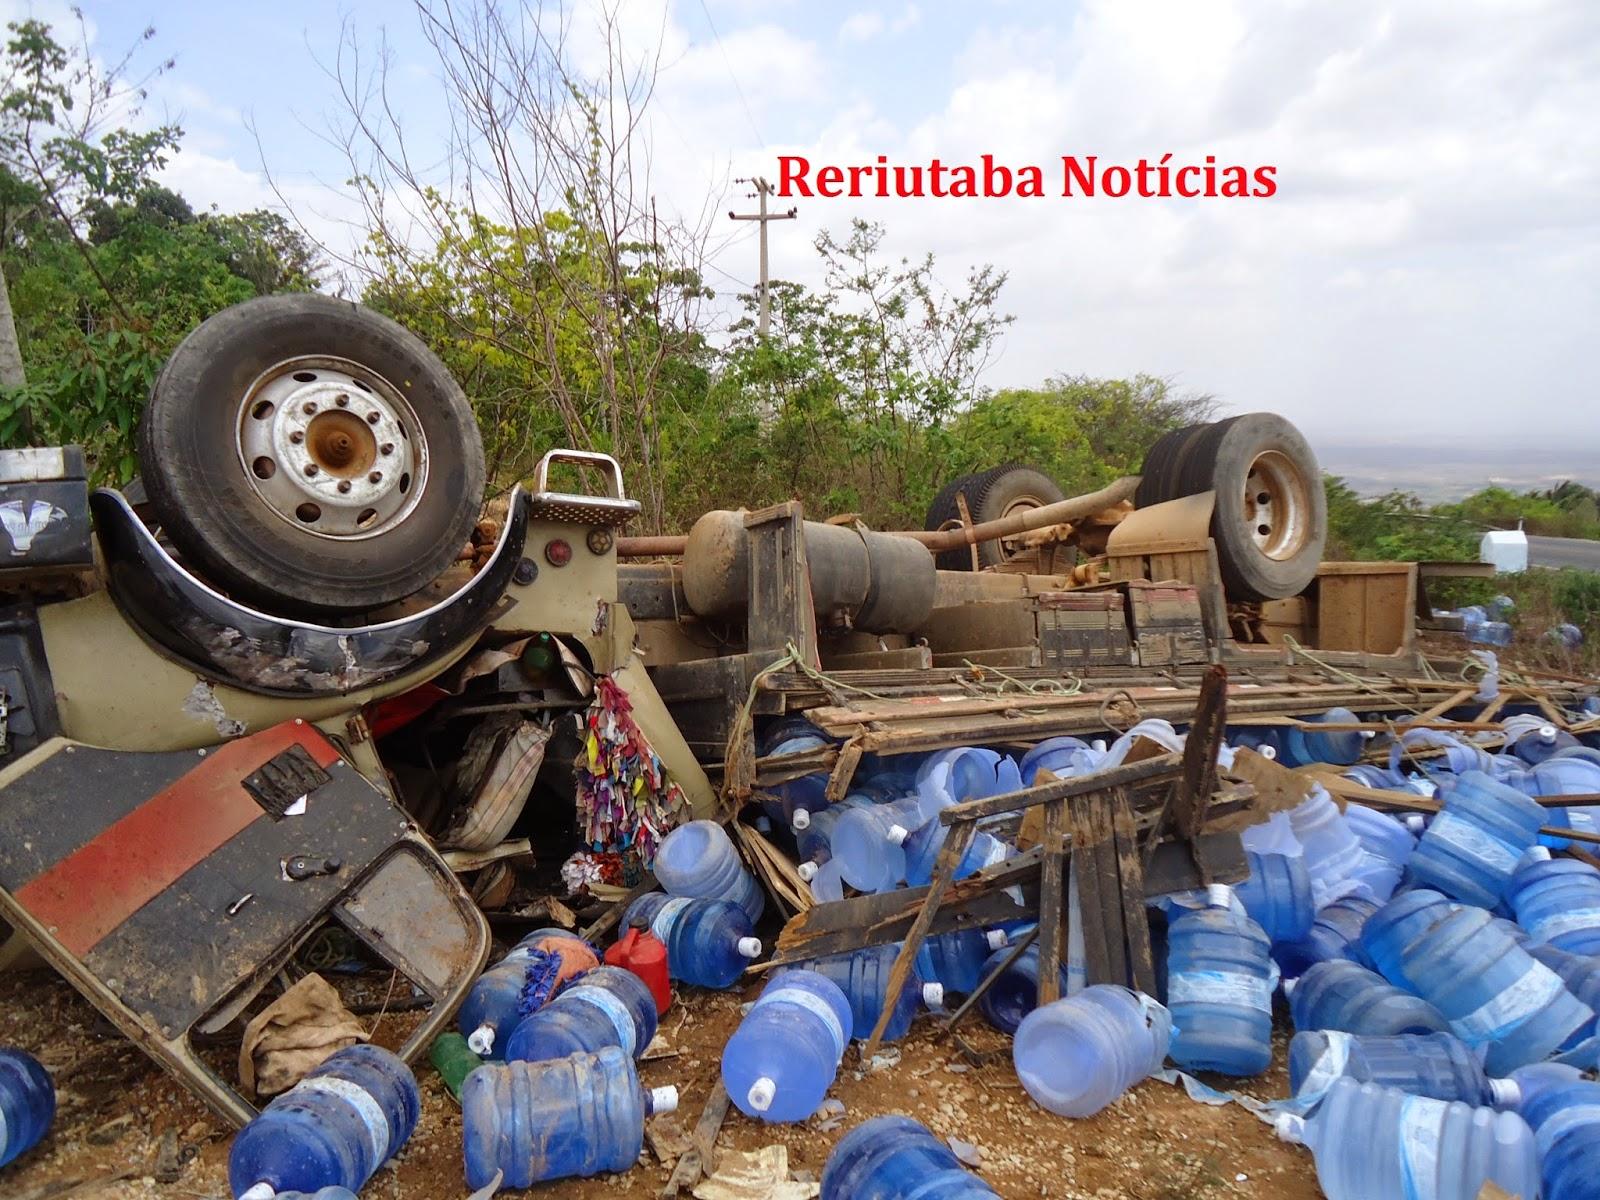 Reriutaba: Caminhão que transportava água mineral Nieta tomba na CE 366, descida da Serra da Ibiapaba.